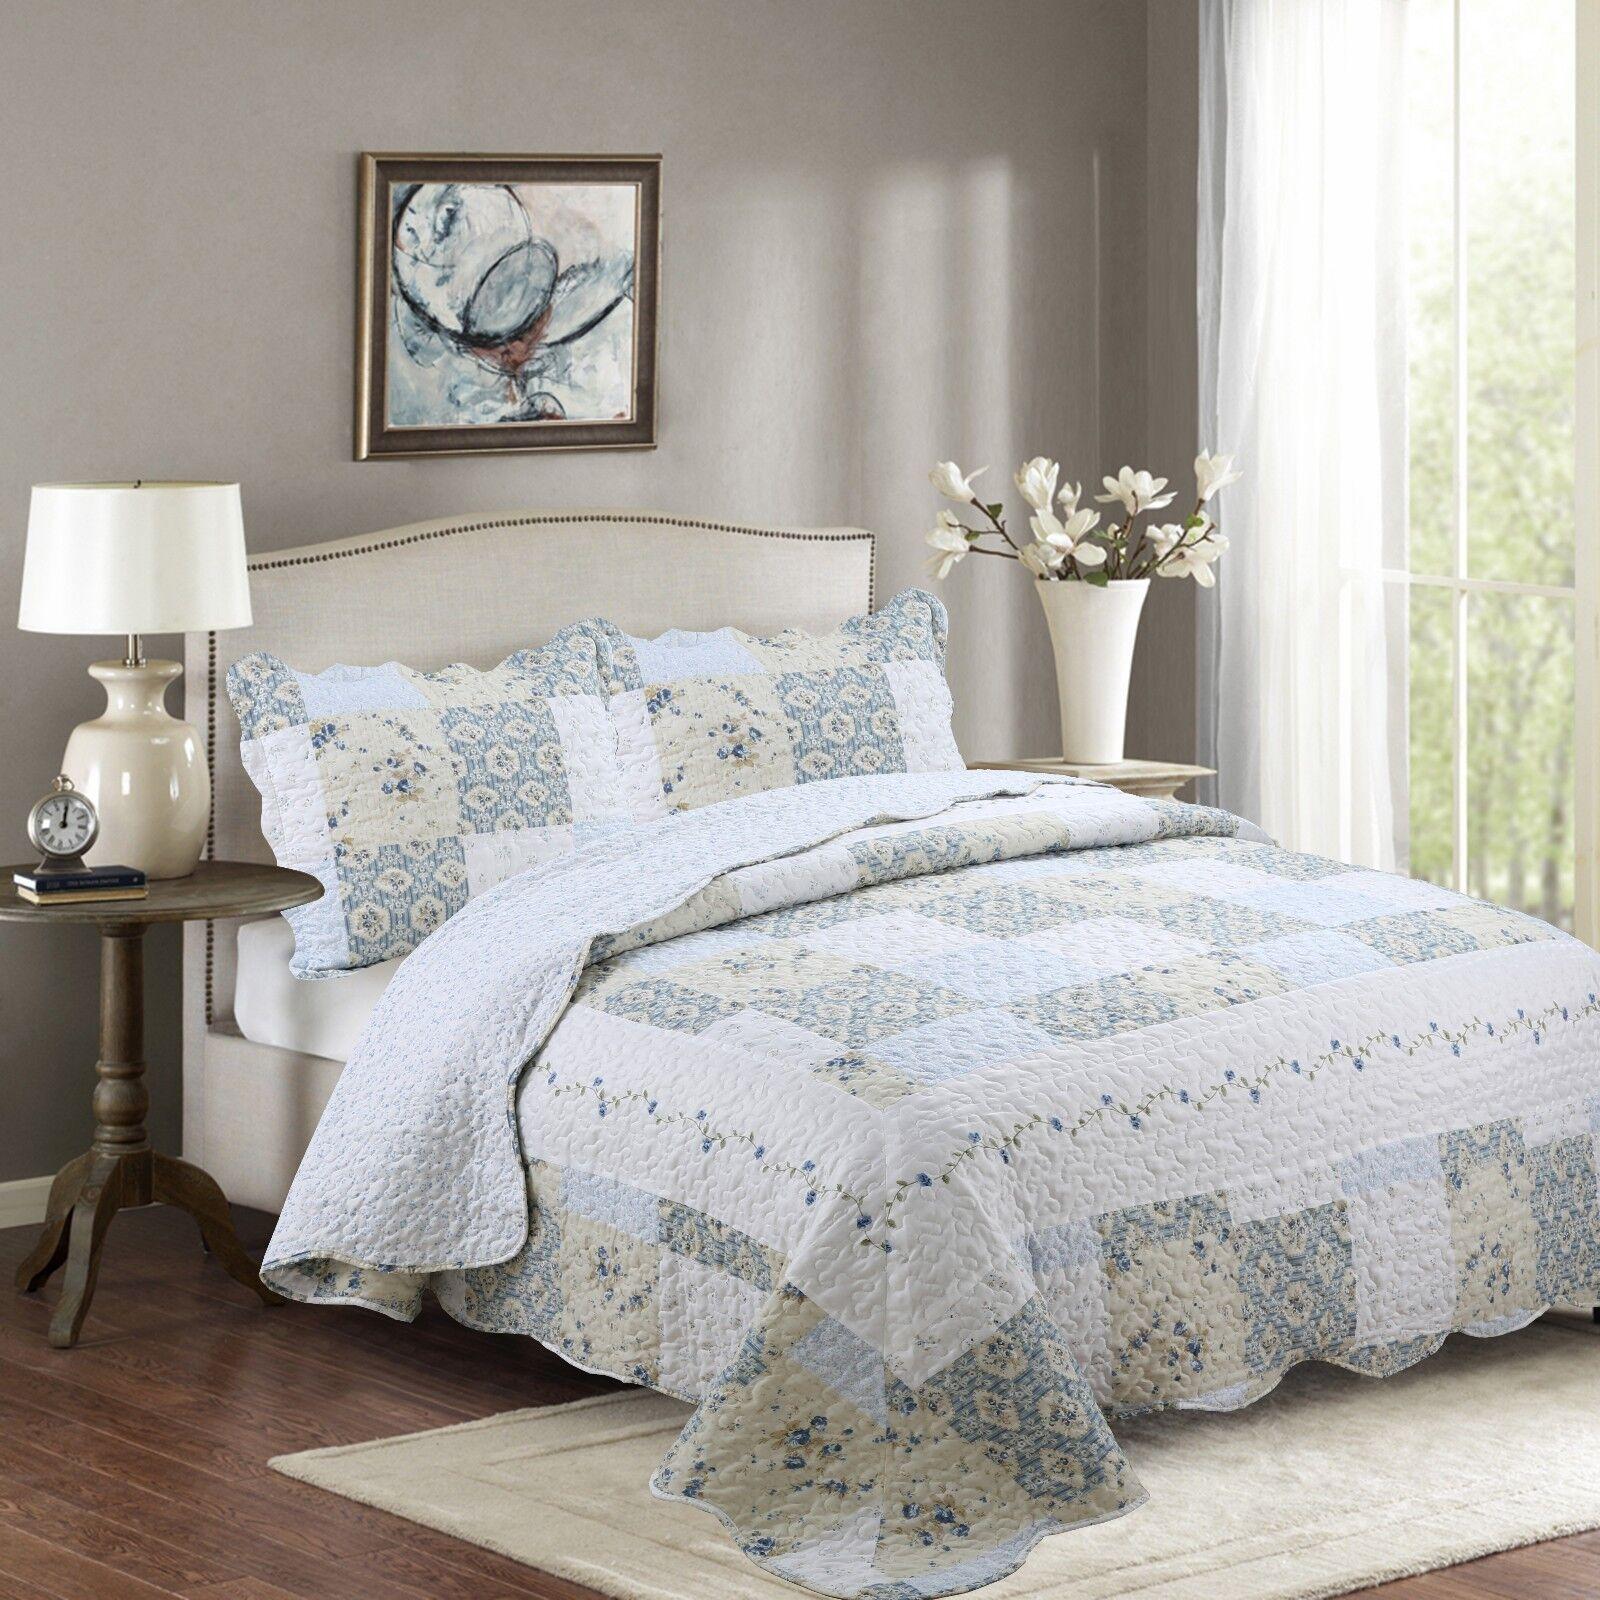 reversible bedspread floral off white blue beige